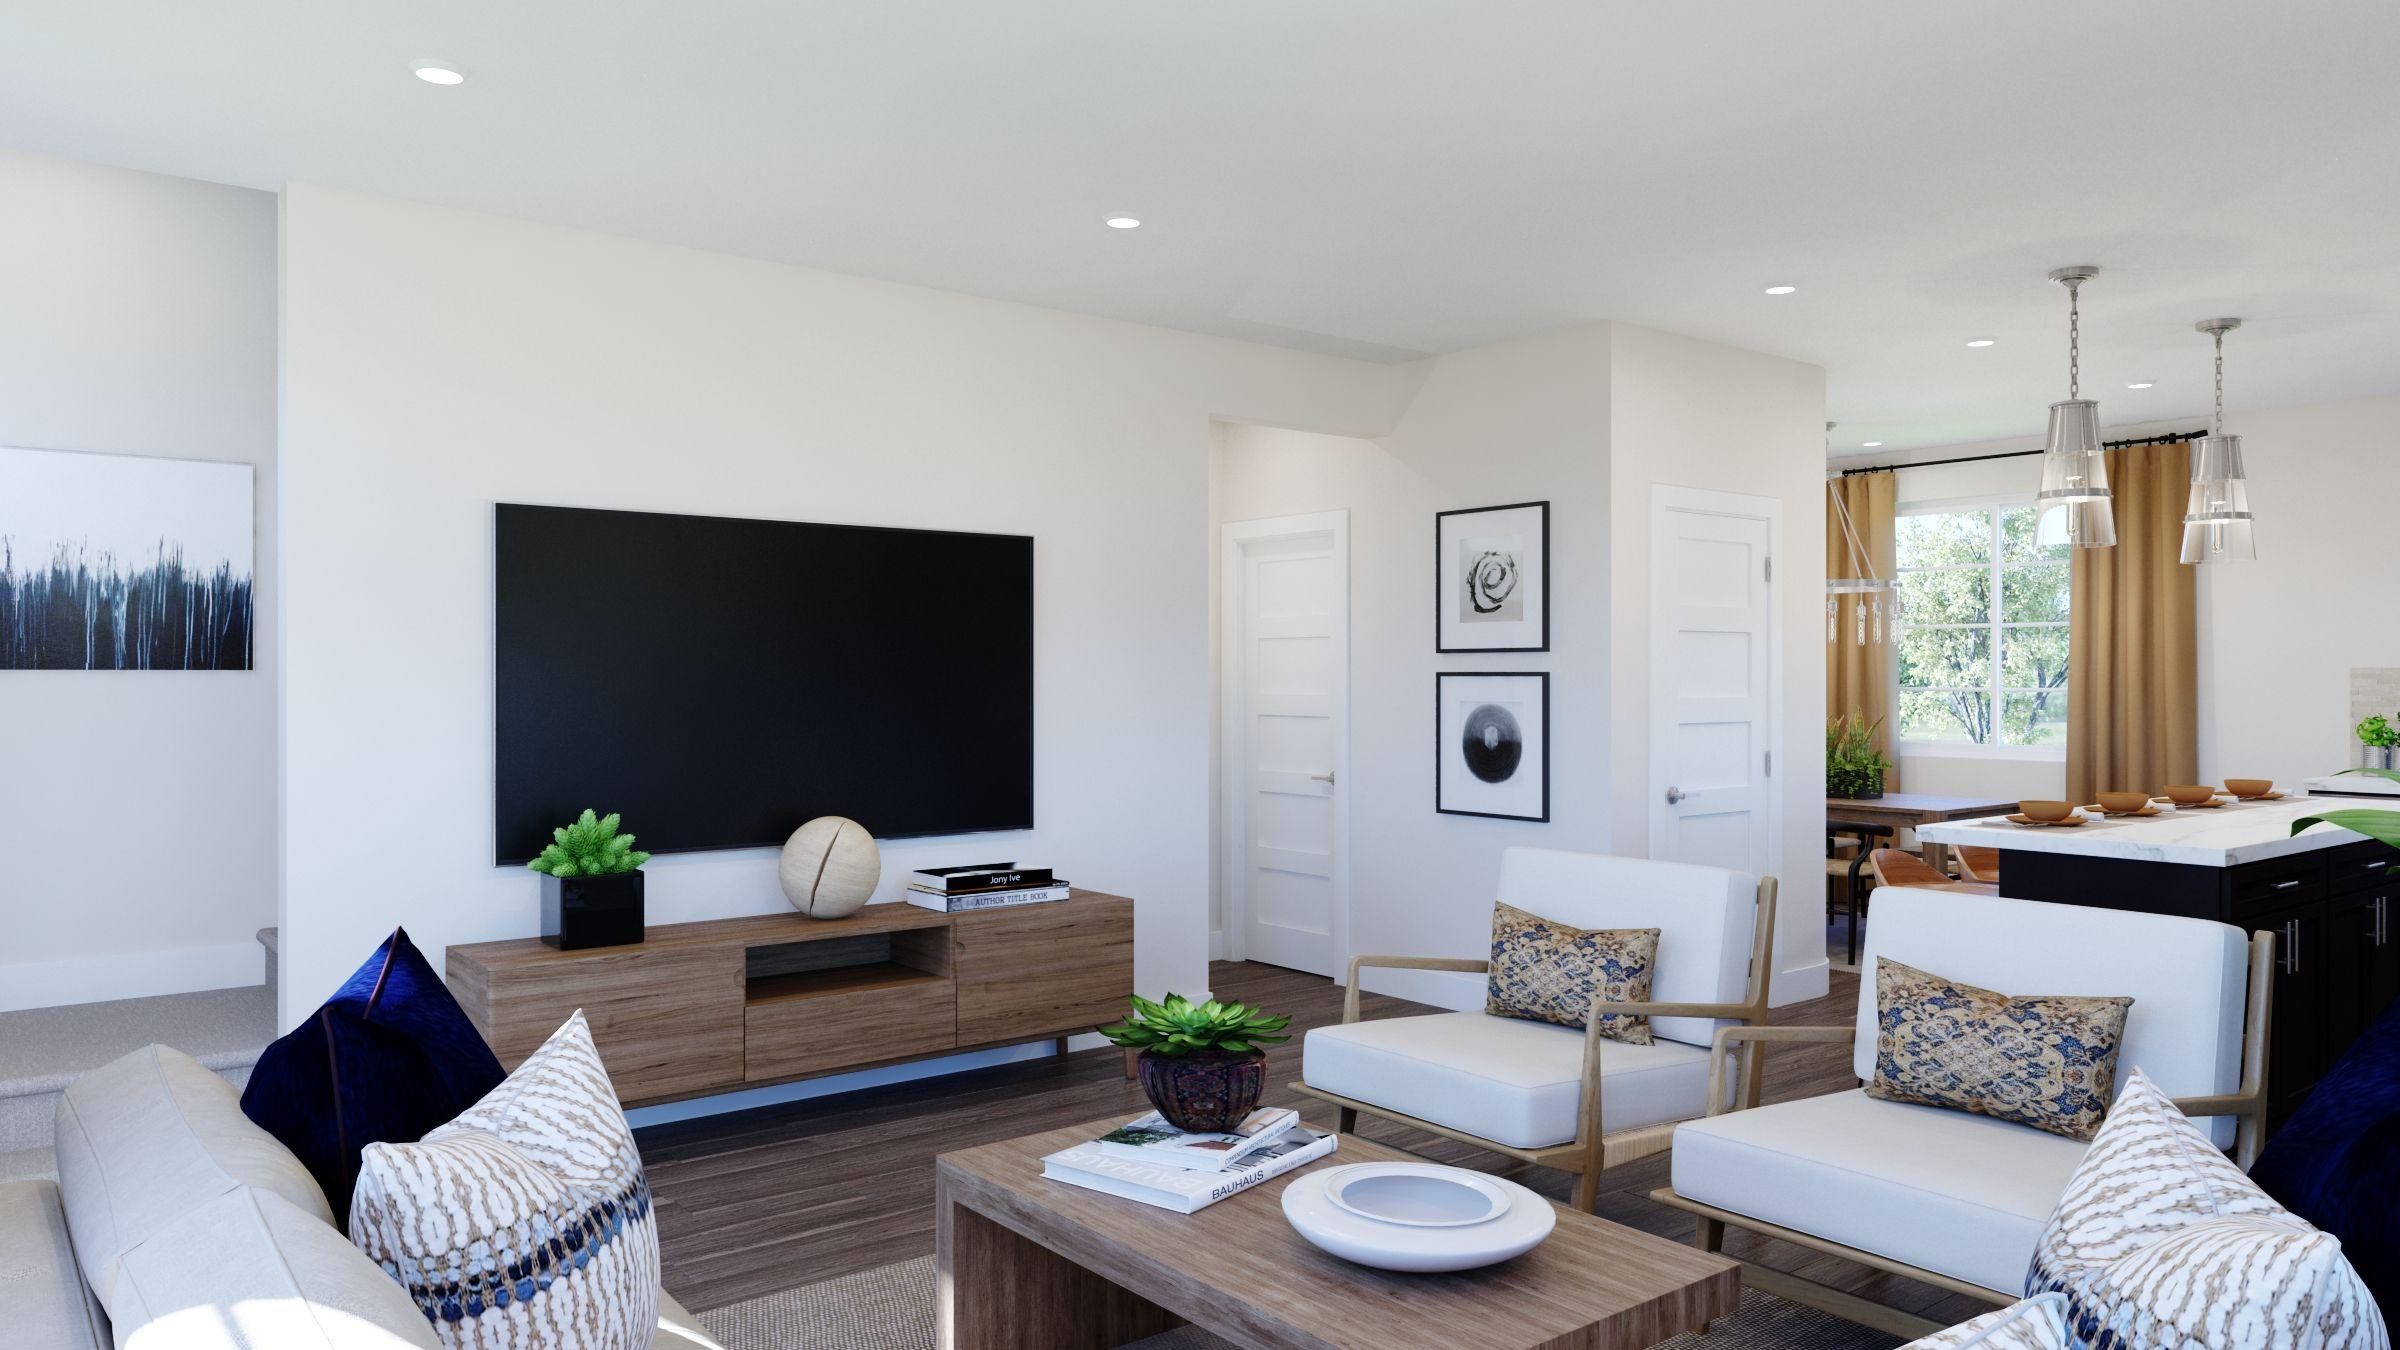 Living Area featured in the Volara Plan 3 By Bonanni Development in Orange County, CA